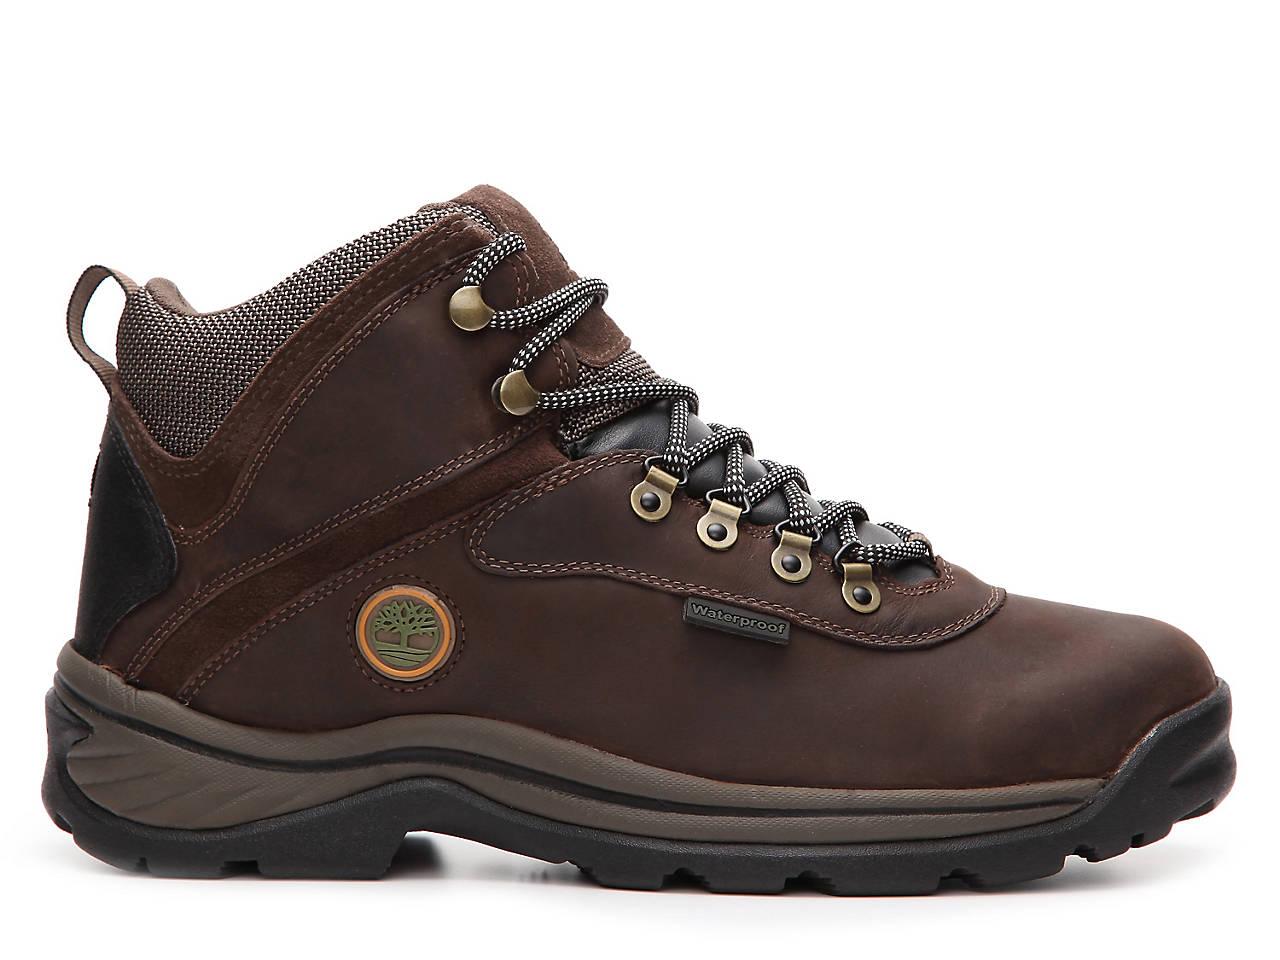 4b35d6914e1 White Ledge Hiking Boot